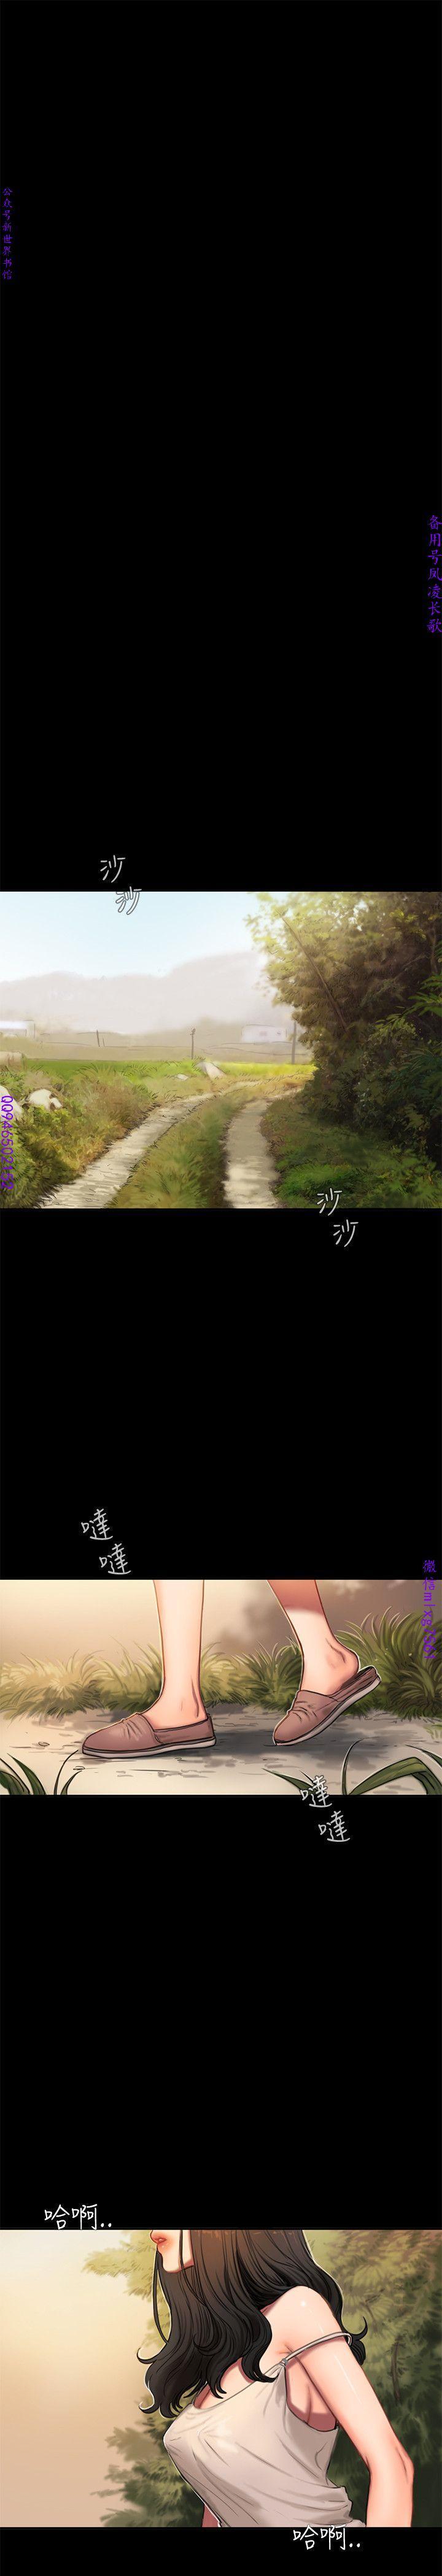 Run away 1-10【中文】 1